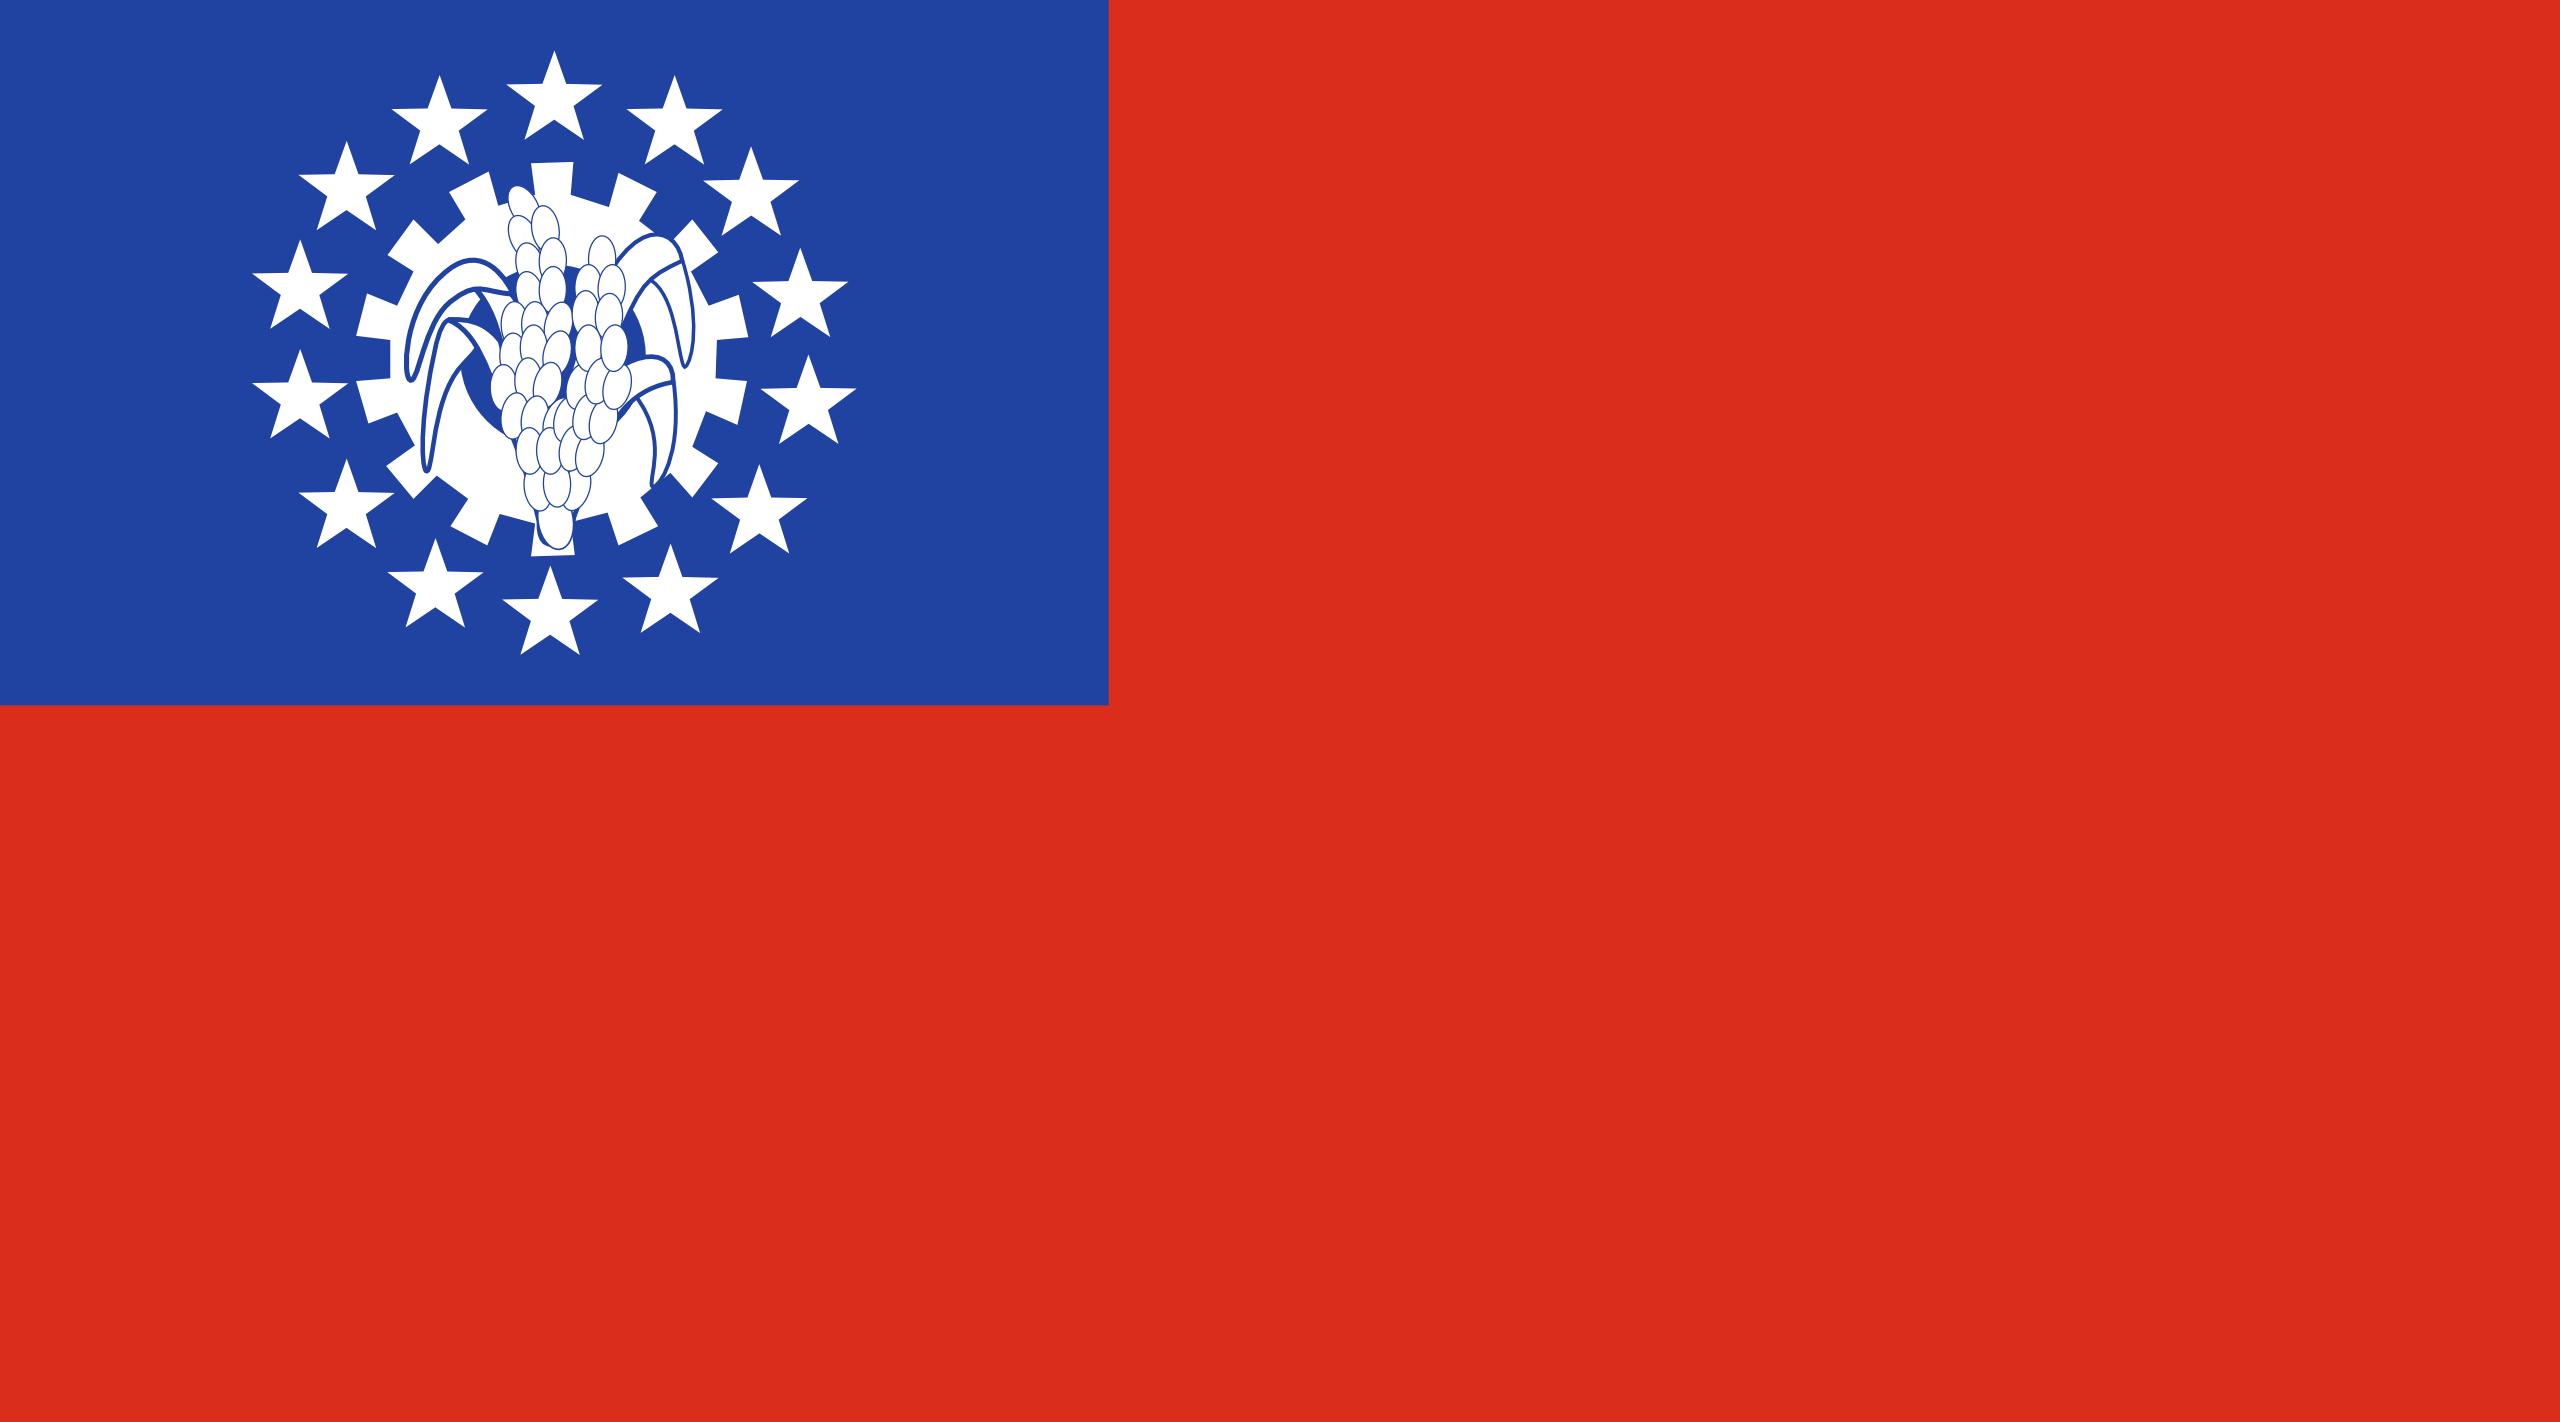 Download a flag or use it on websites - Myanmar Flag PNG